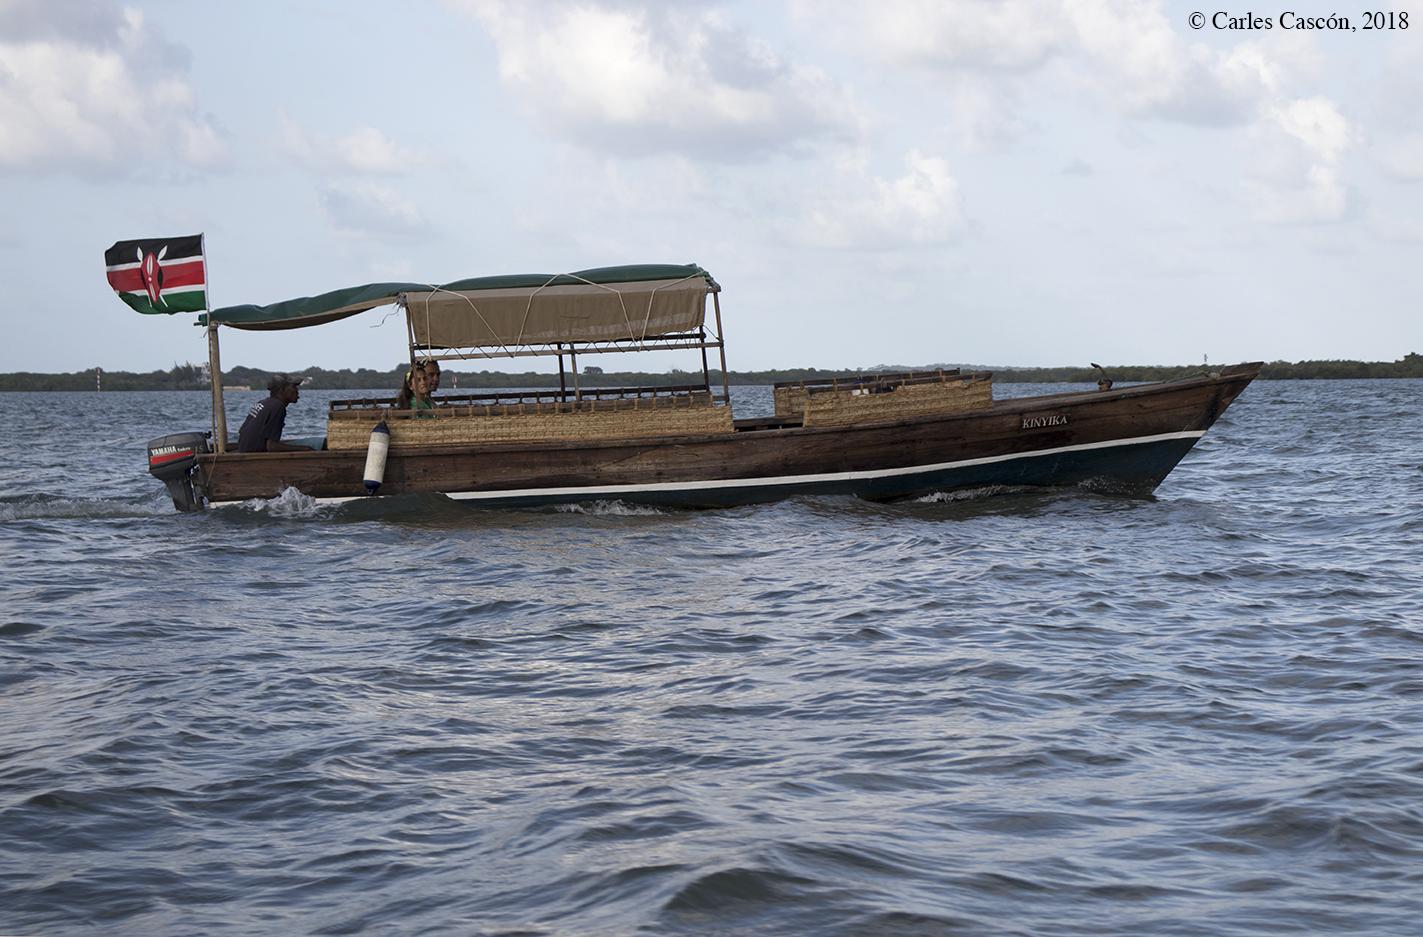 Barco que cubre el trayecto Lamu-Shela